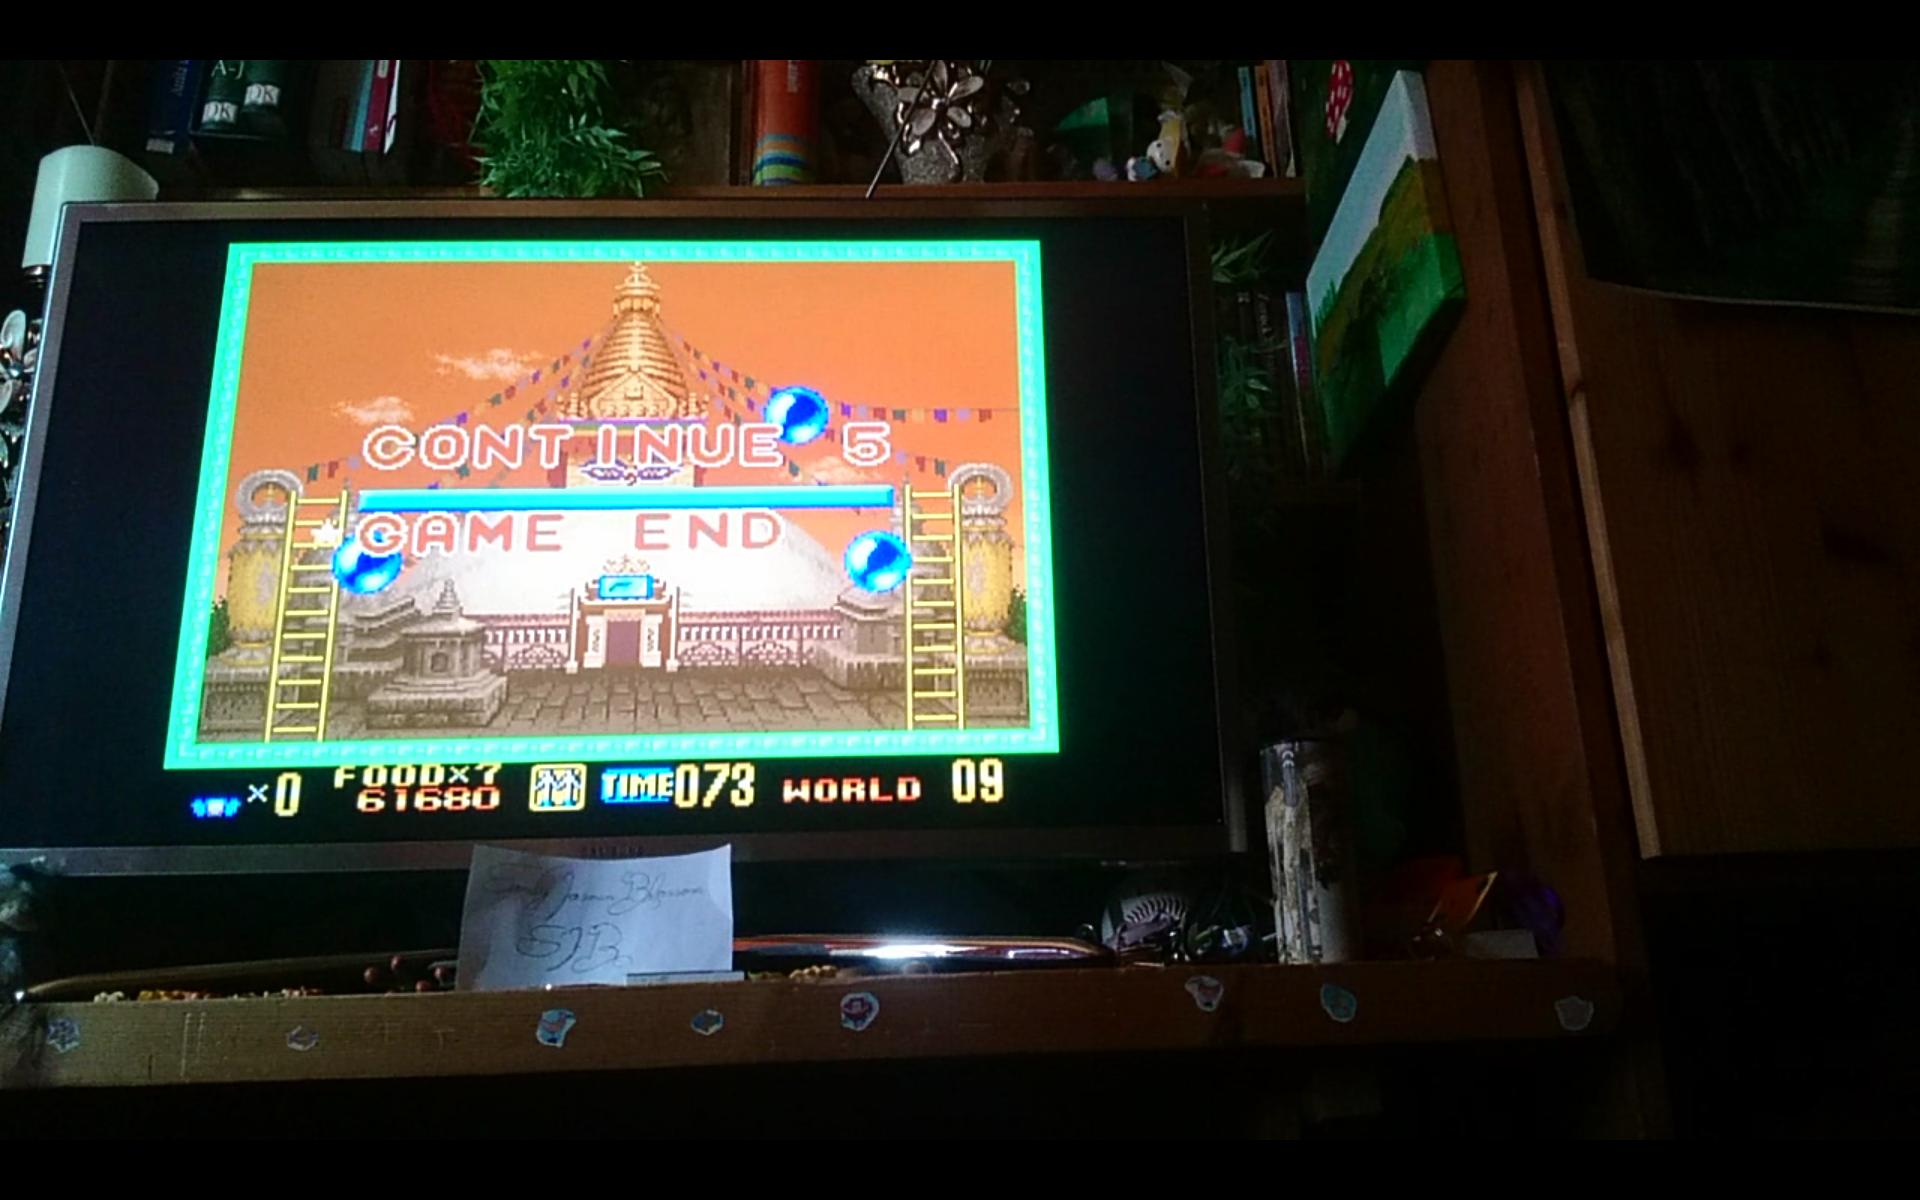 SandyJasminBlossom: Super Buster Bros: Tour Mode [Easy] (SNES/Super Famicom Emulated) 61,680 points on 2018-08-02 16:06:10